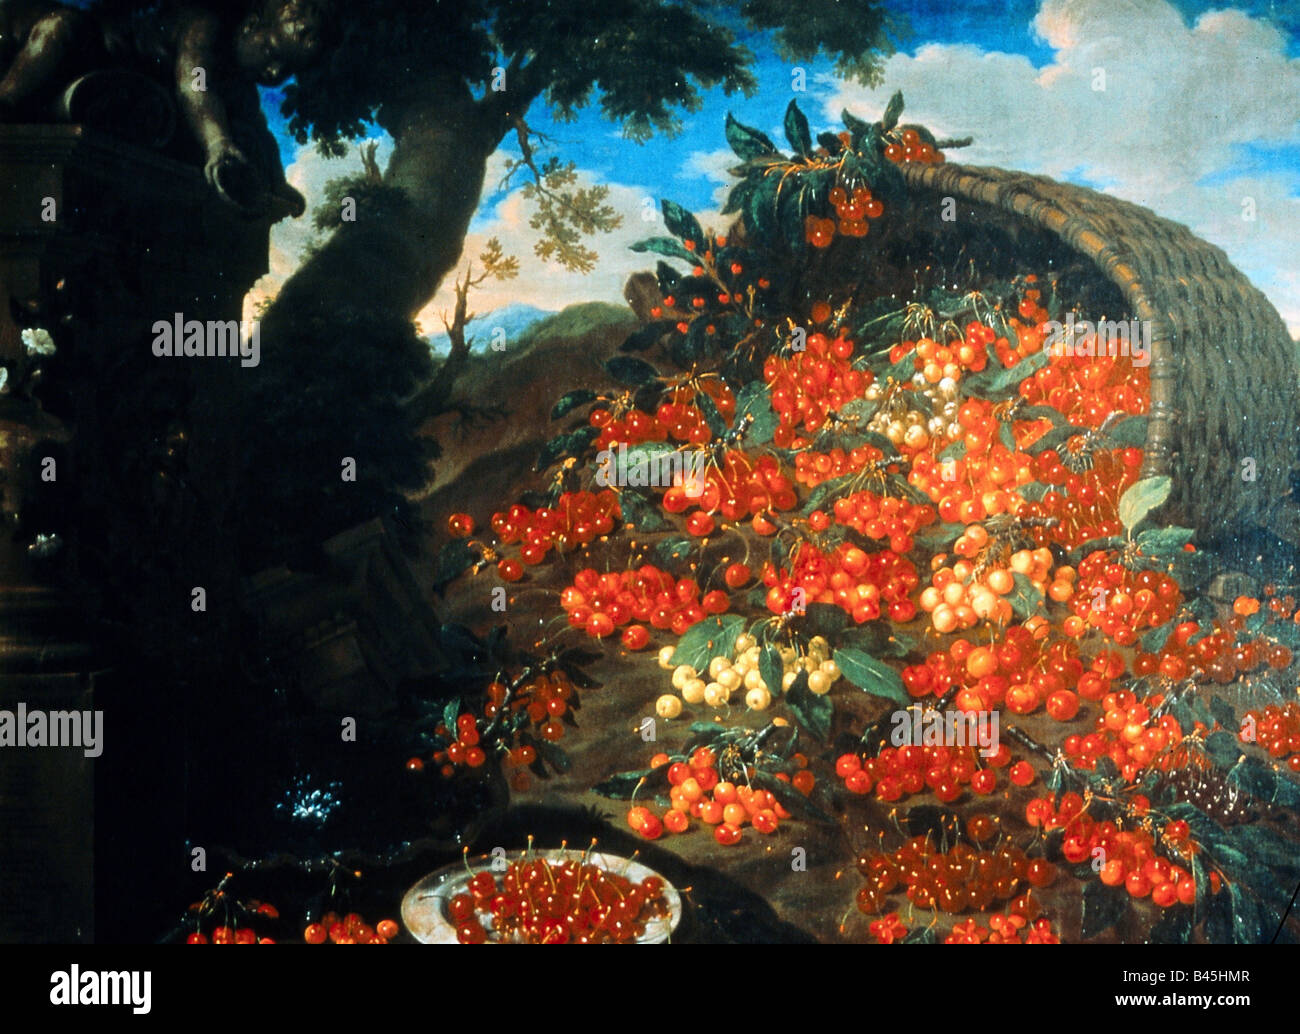 "Bildende Kunst, Bimbi, Bartolomeo (1648-1730), 'Diverse varieta di Weingut San Leonardo"", Artist's Stockbild"